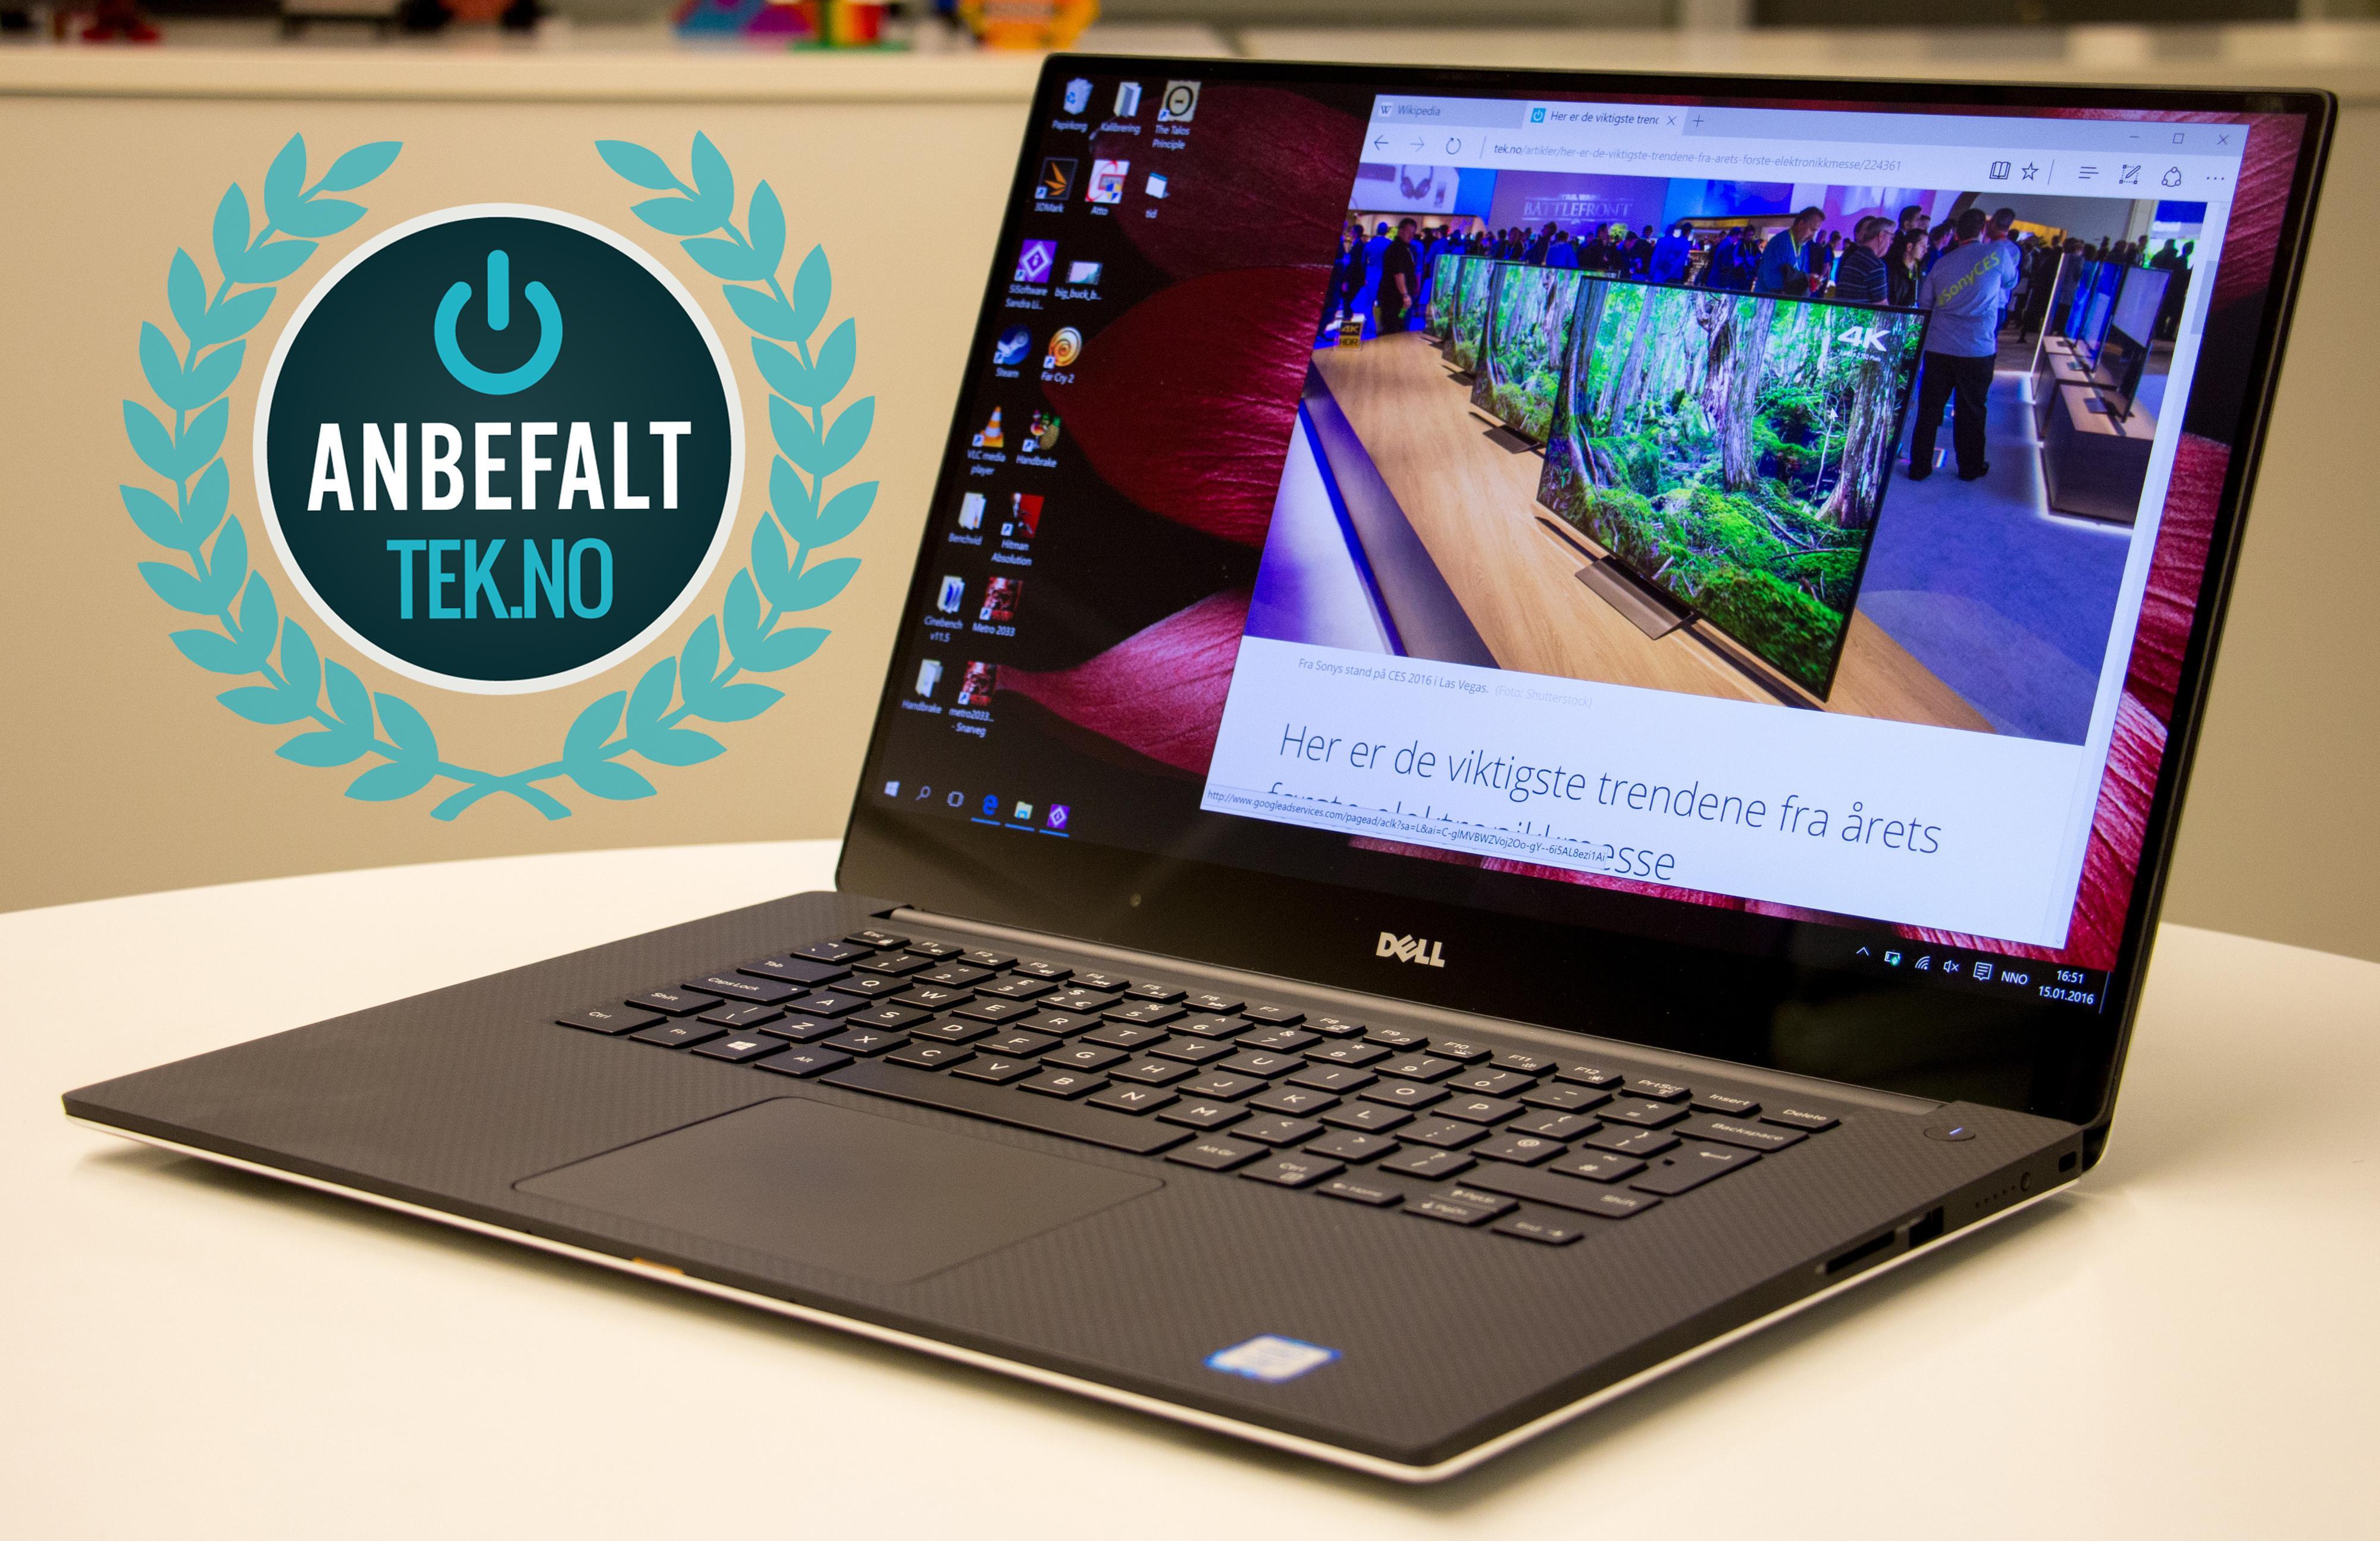 Dell XPS 15 får med seg en anbefaling av oss.